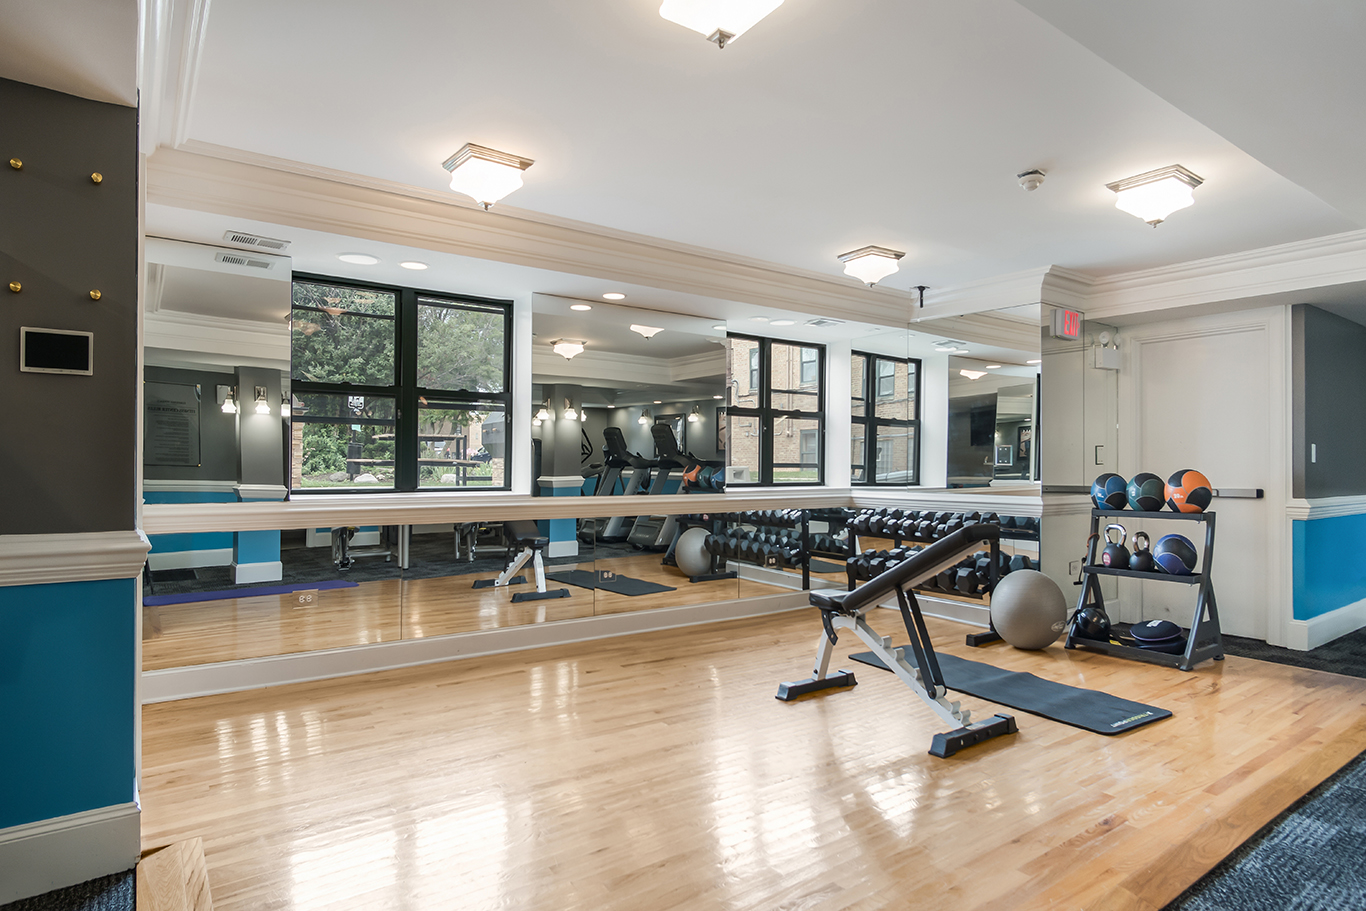 Fitness Center at Elmhurst Terrace Apartments in Elmhurst, Illinois